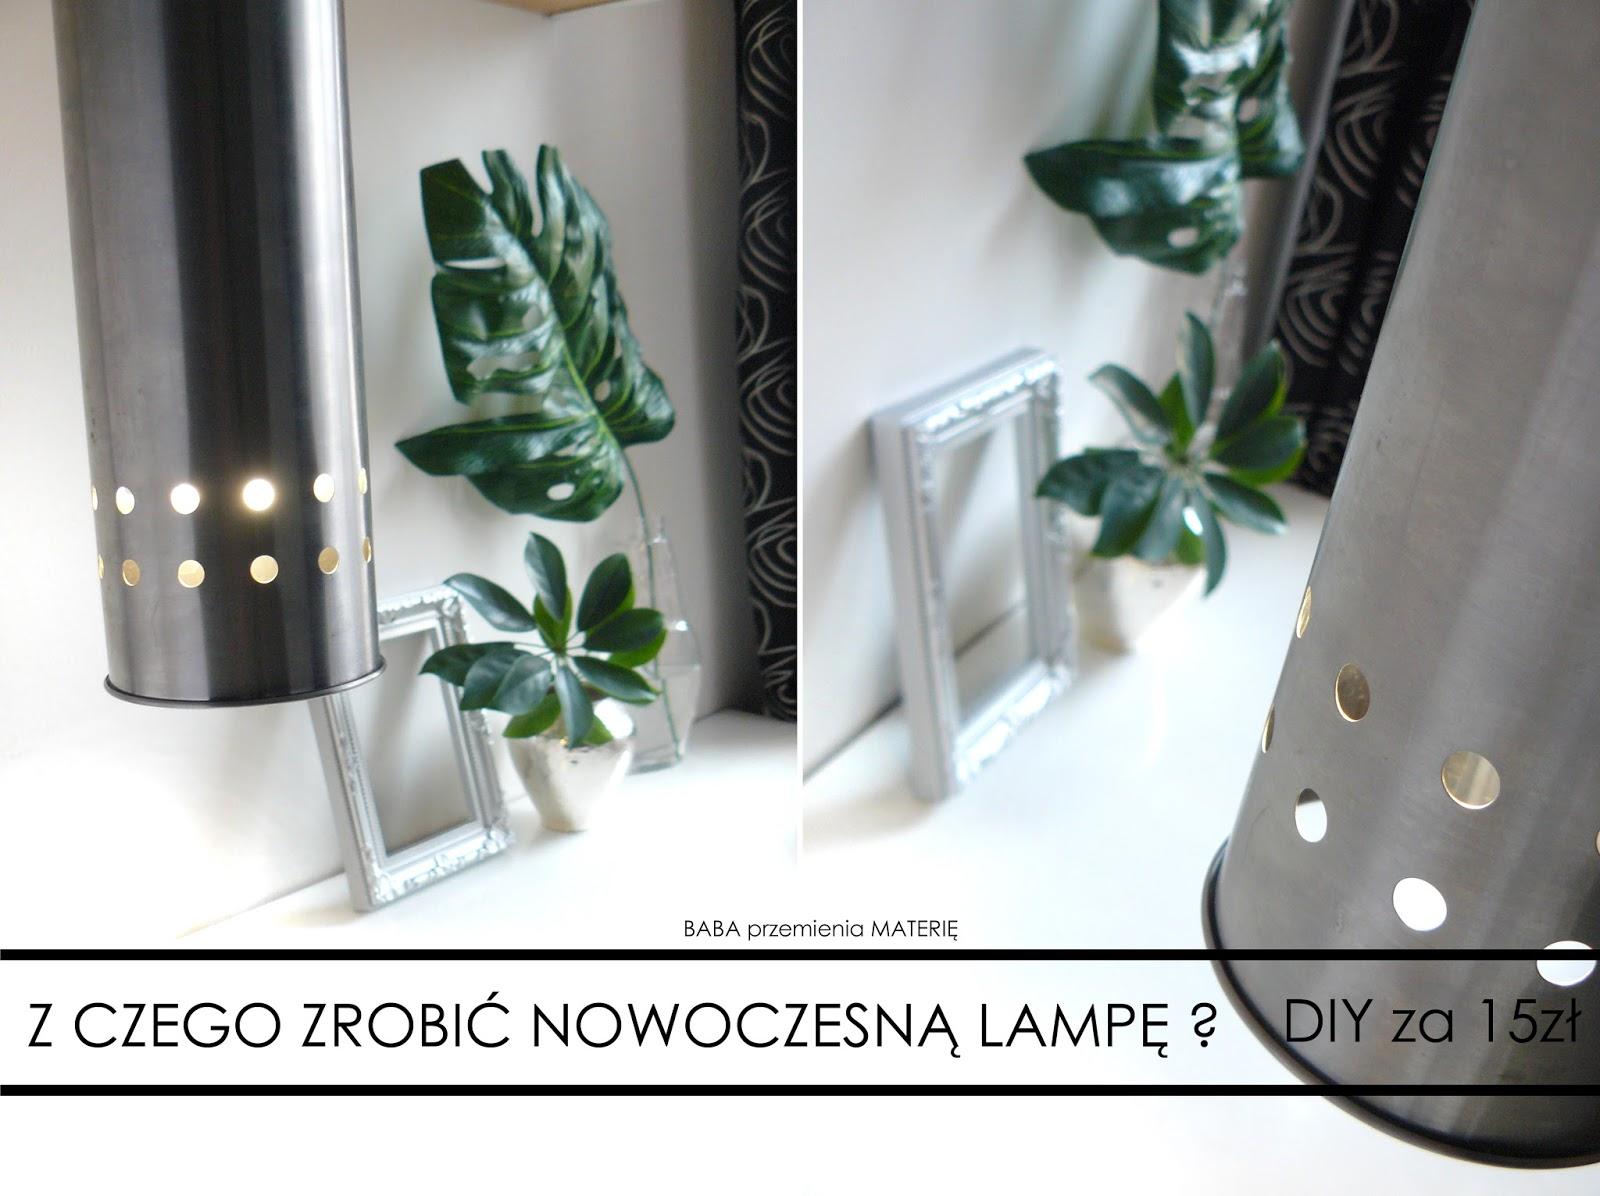 http://babaprzemieniamaterie.blogspot.com/2016/03/jak-zrobic-nowoczesna-stalowa-lampe-ze.html#more